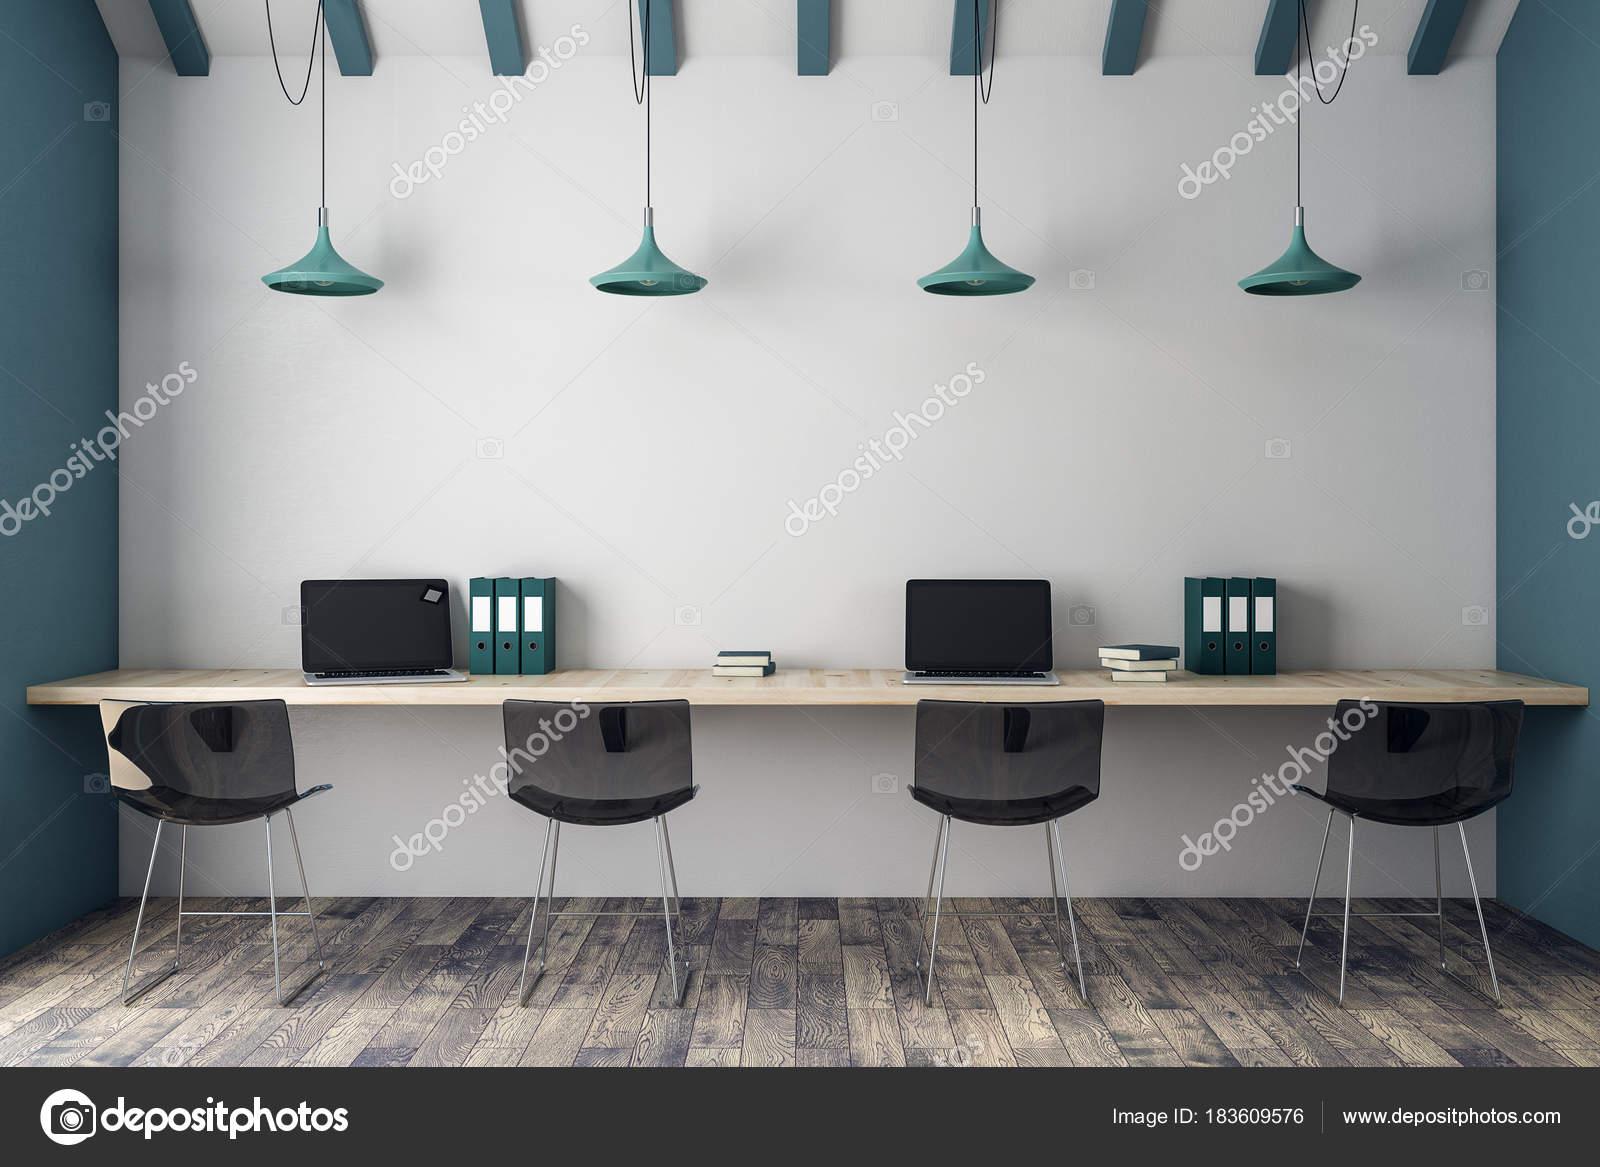 Moderne büroeinrichtung  Moderne Büroeinrichtung coworking — Stockfoto © peshkova #183609576